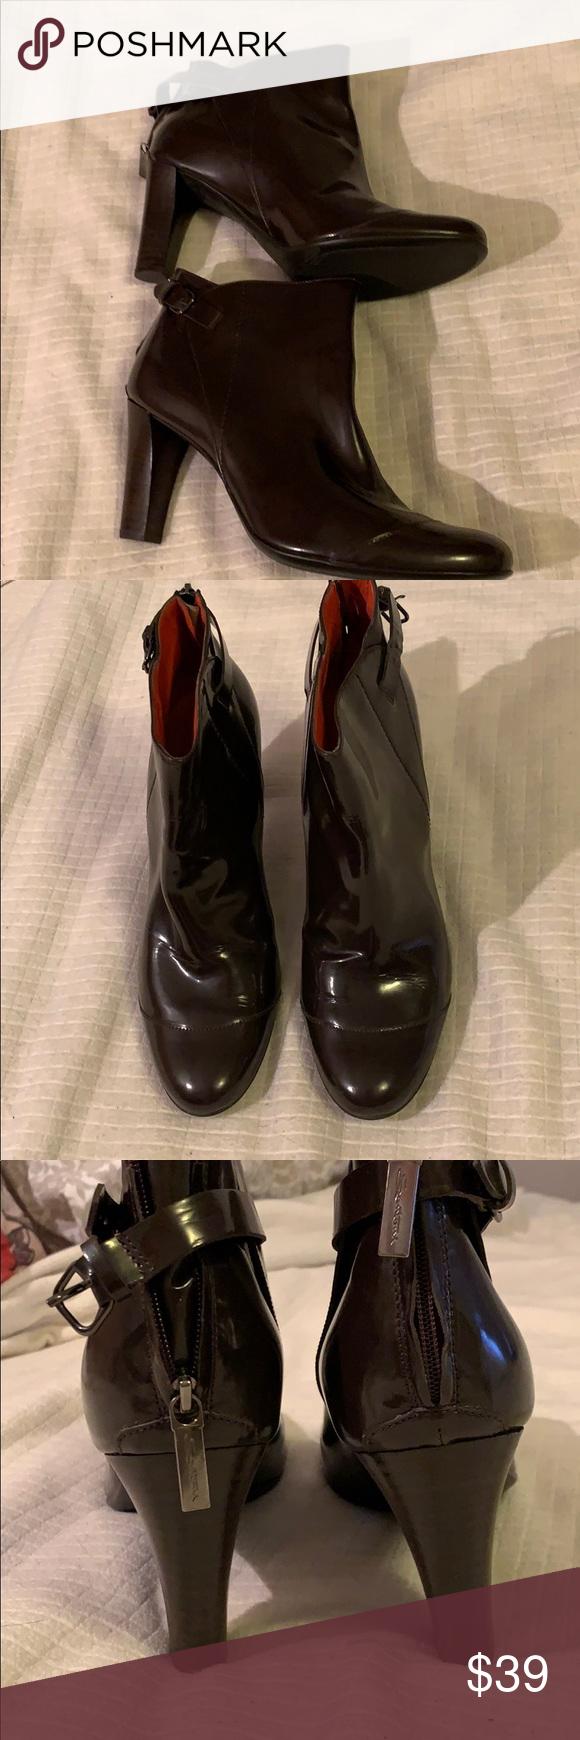 "Santoni 9 Brown patent leather 3.5"" heel booties Santoni 9 Brown patent leathe…"